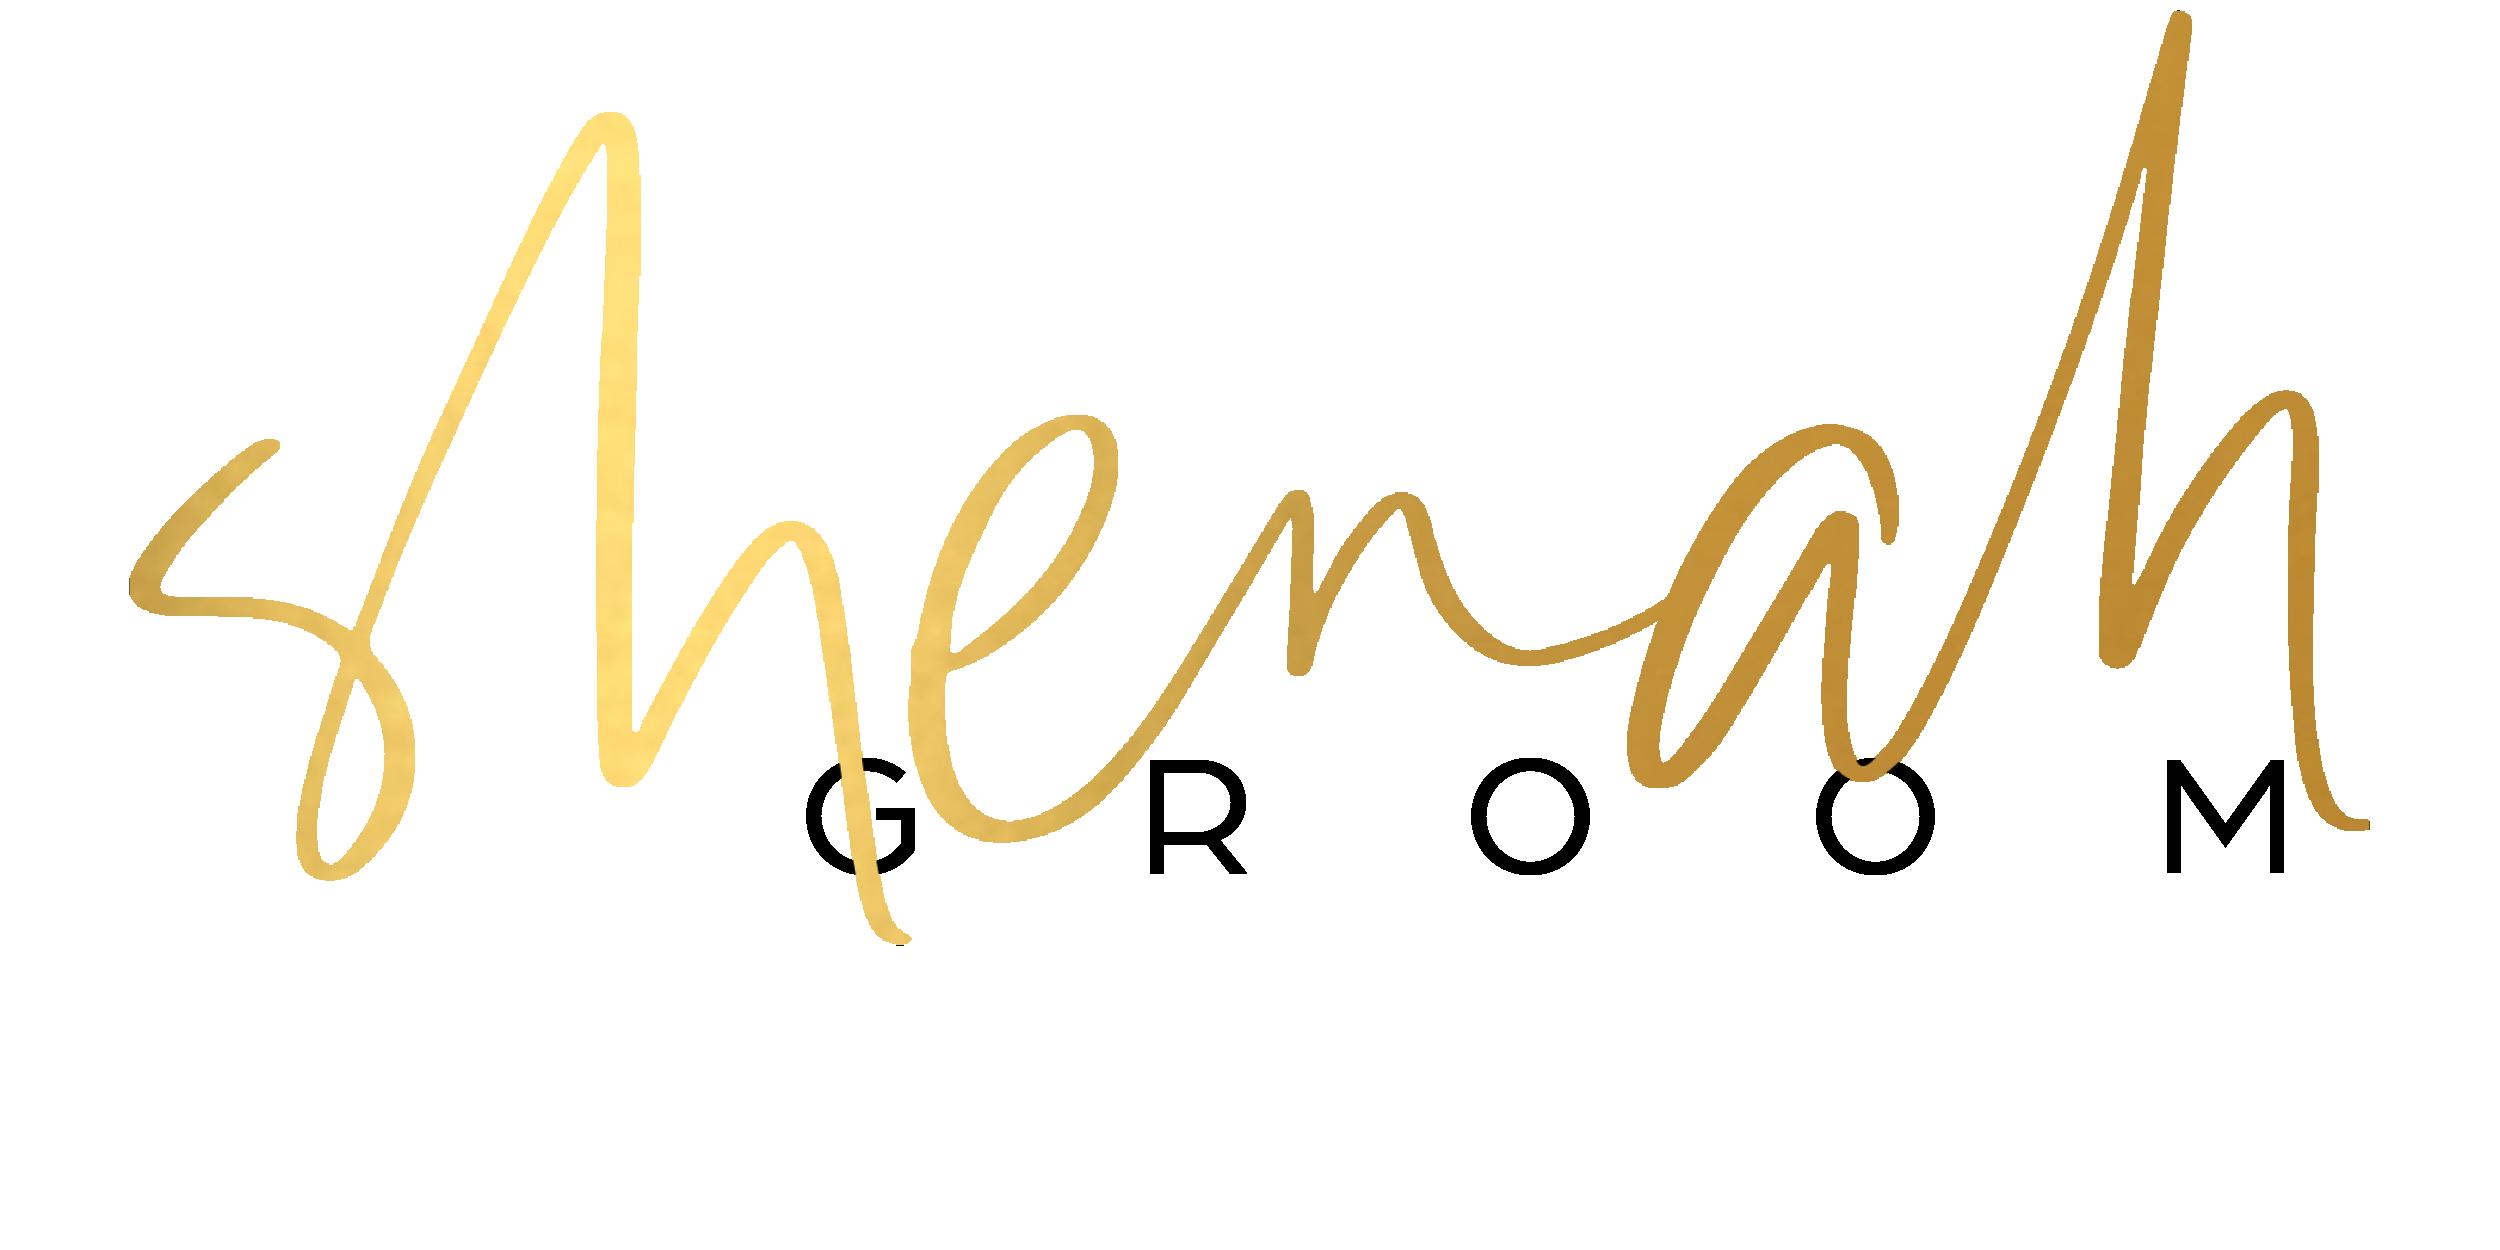 Shenah Groom